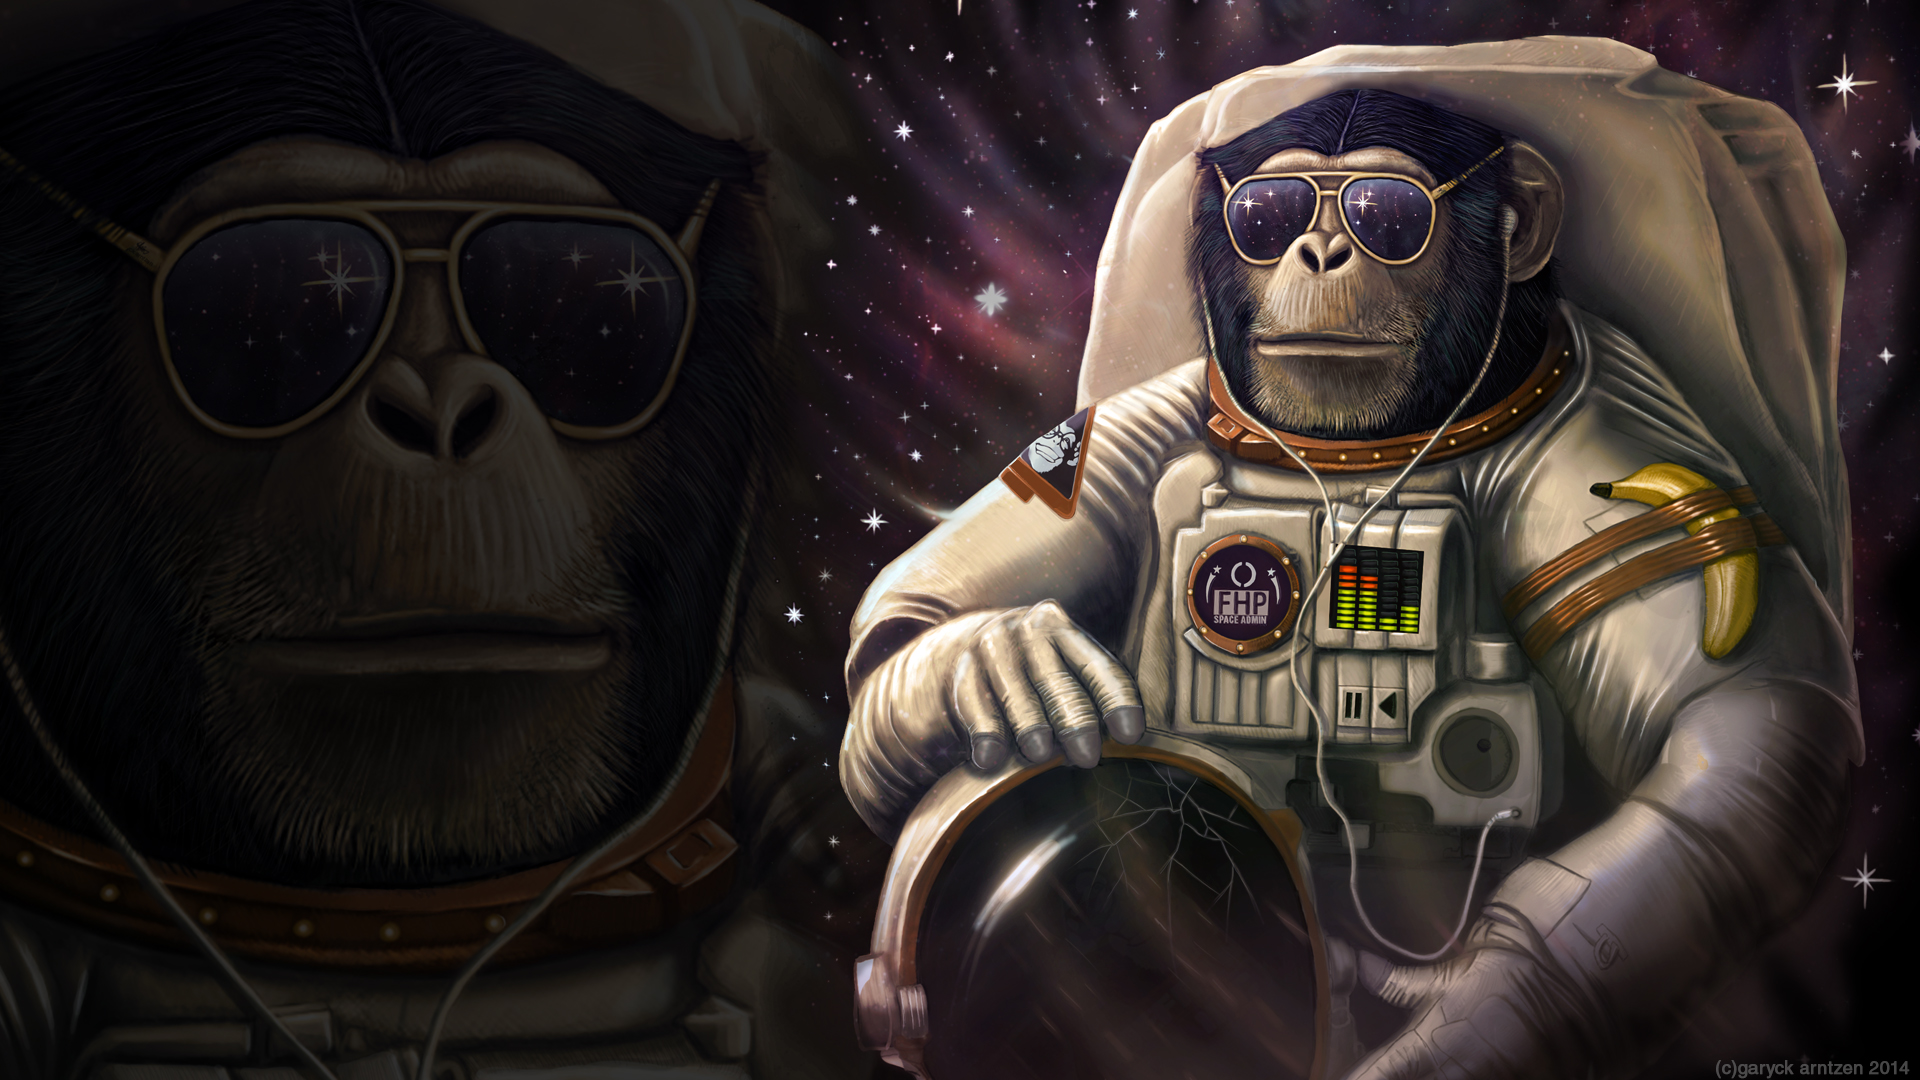 Monkey Sunglasses Astronaut Wtf Banana Wallpaper 1920x1080